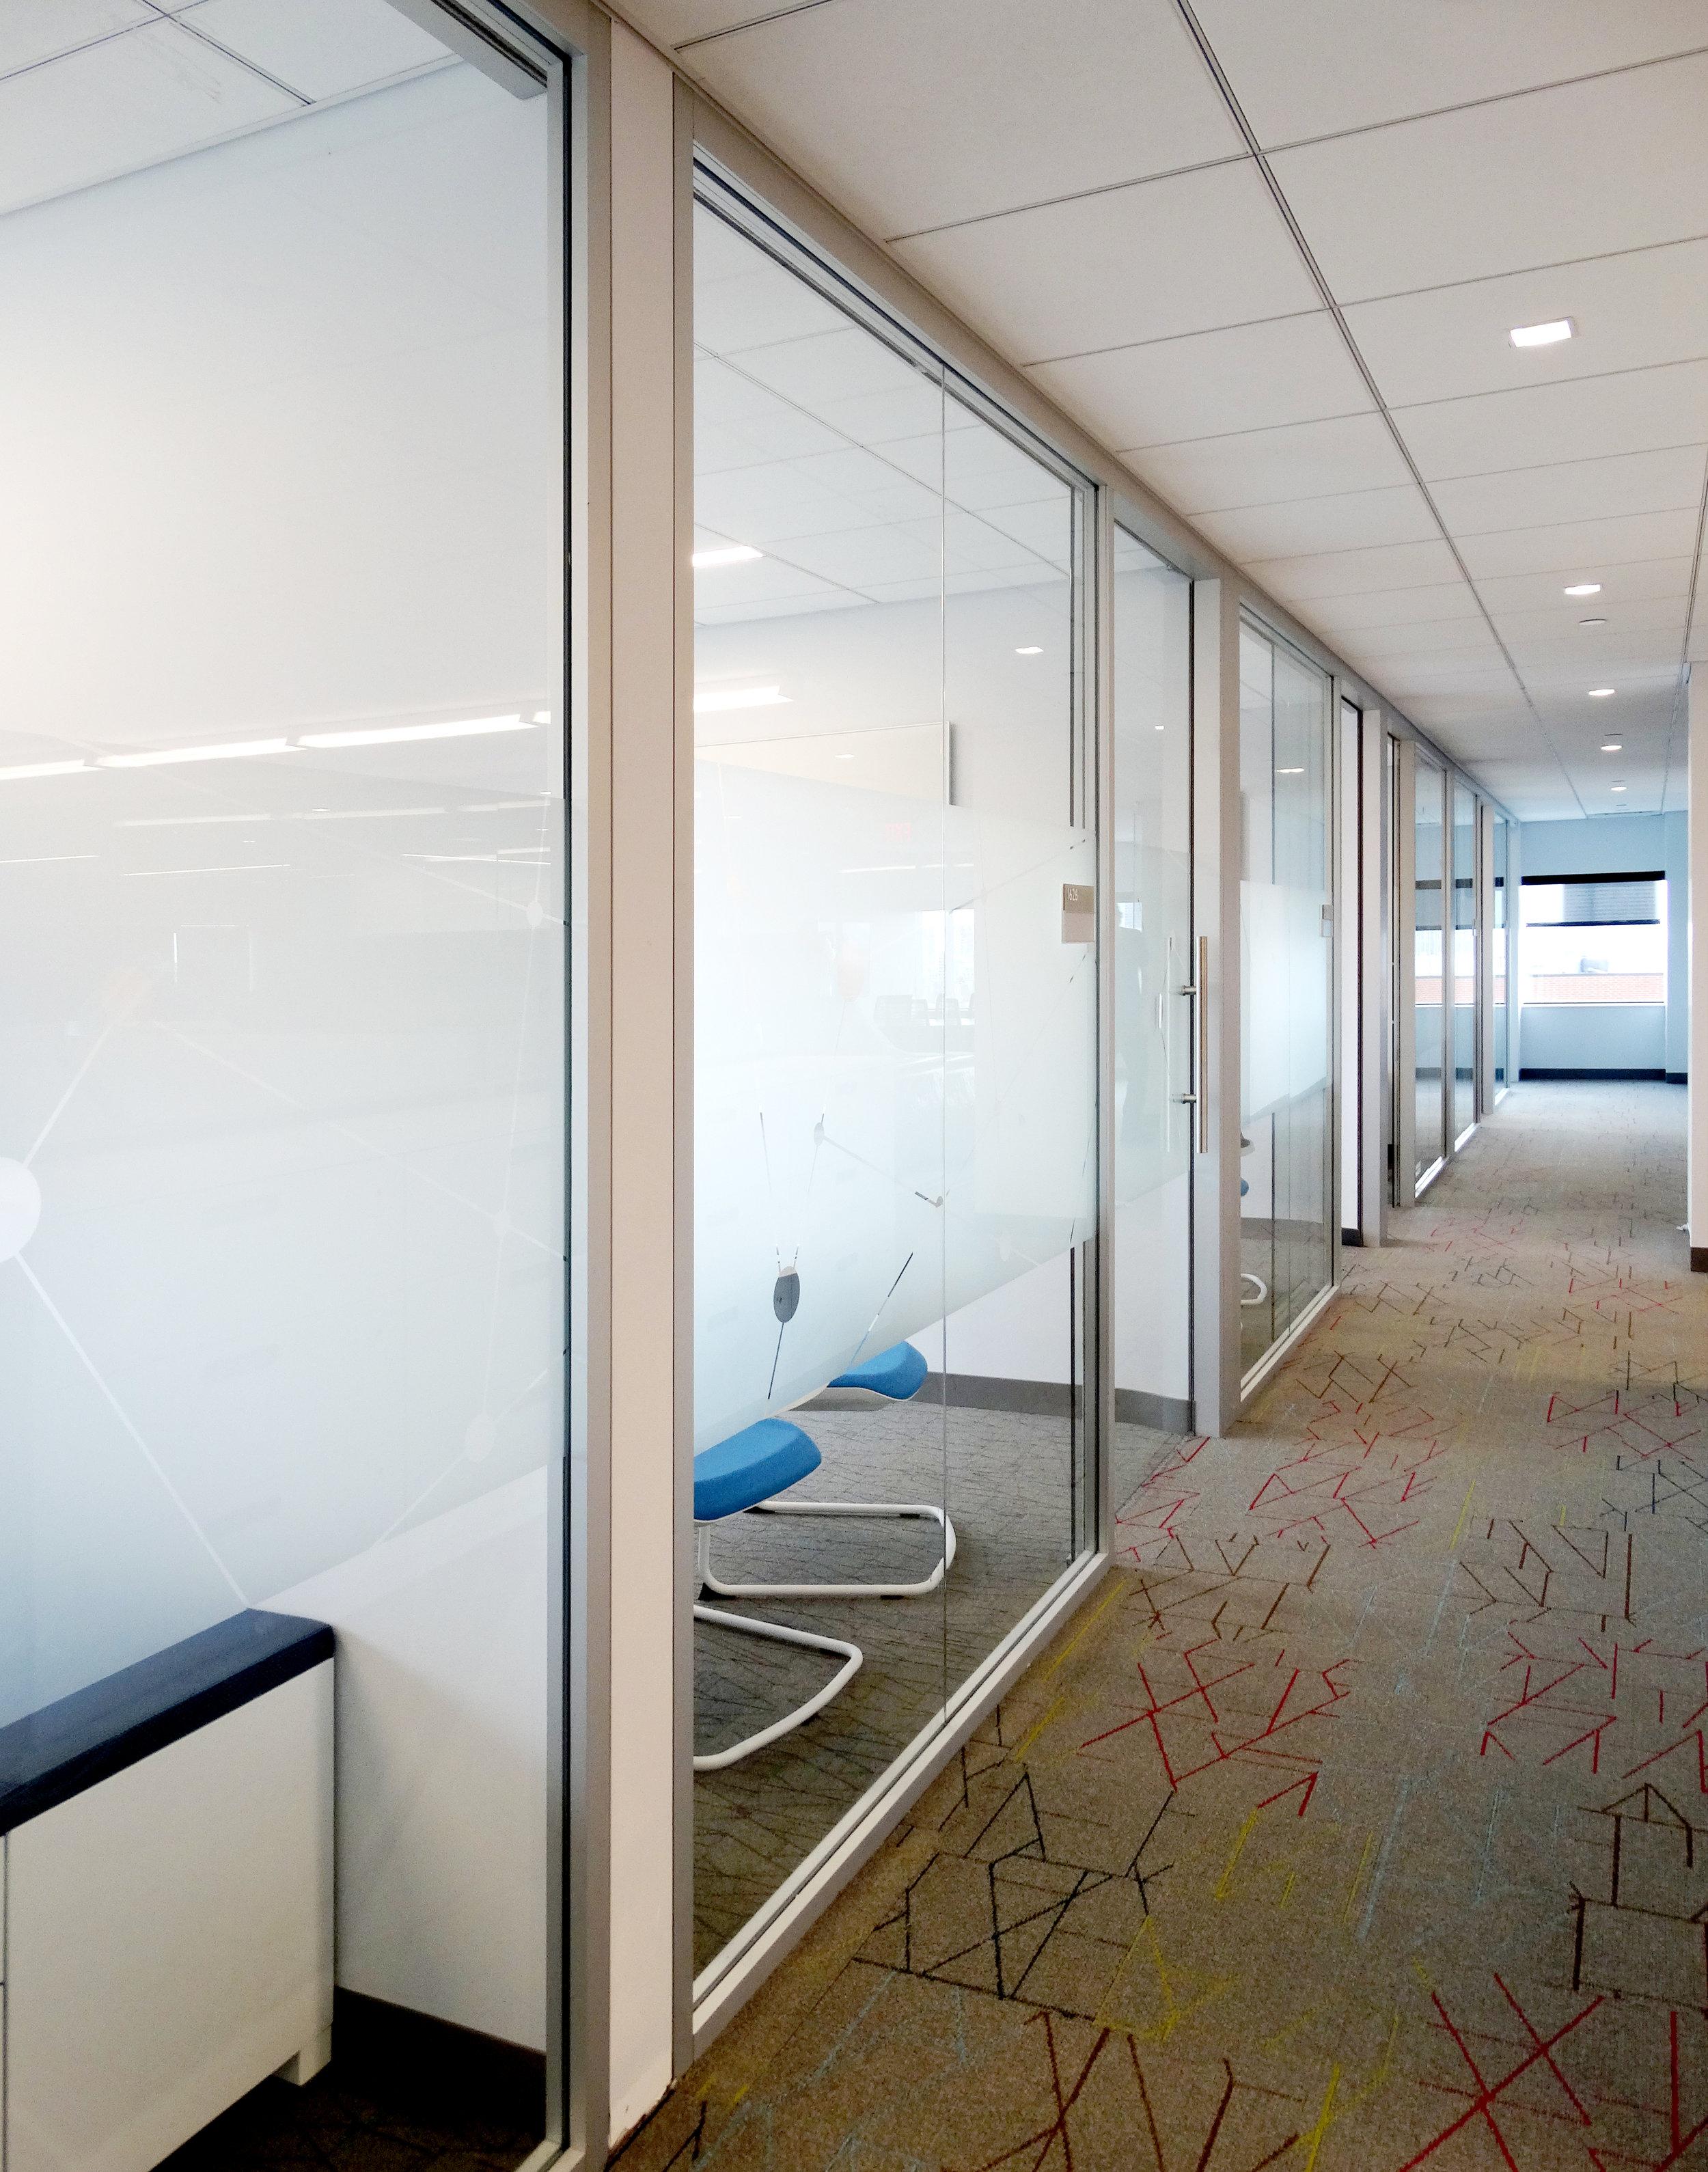 Litespace Glass Office Aluminum Framed Run - Spaceworks AI.jpg